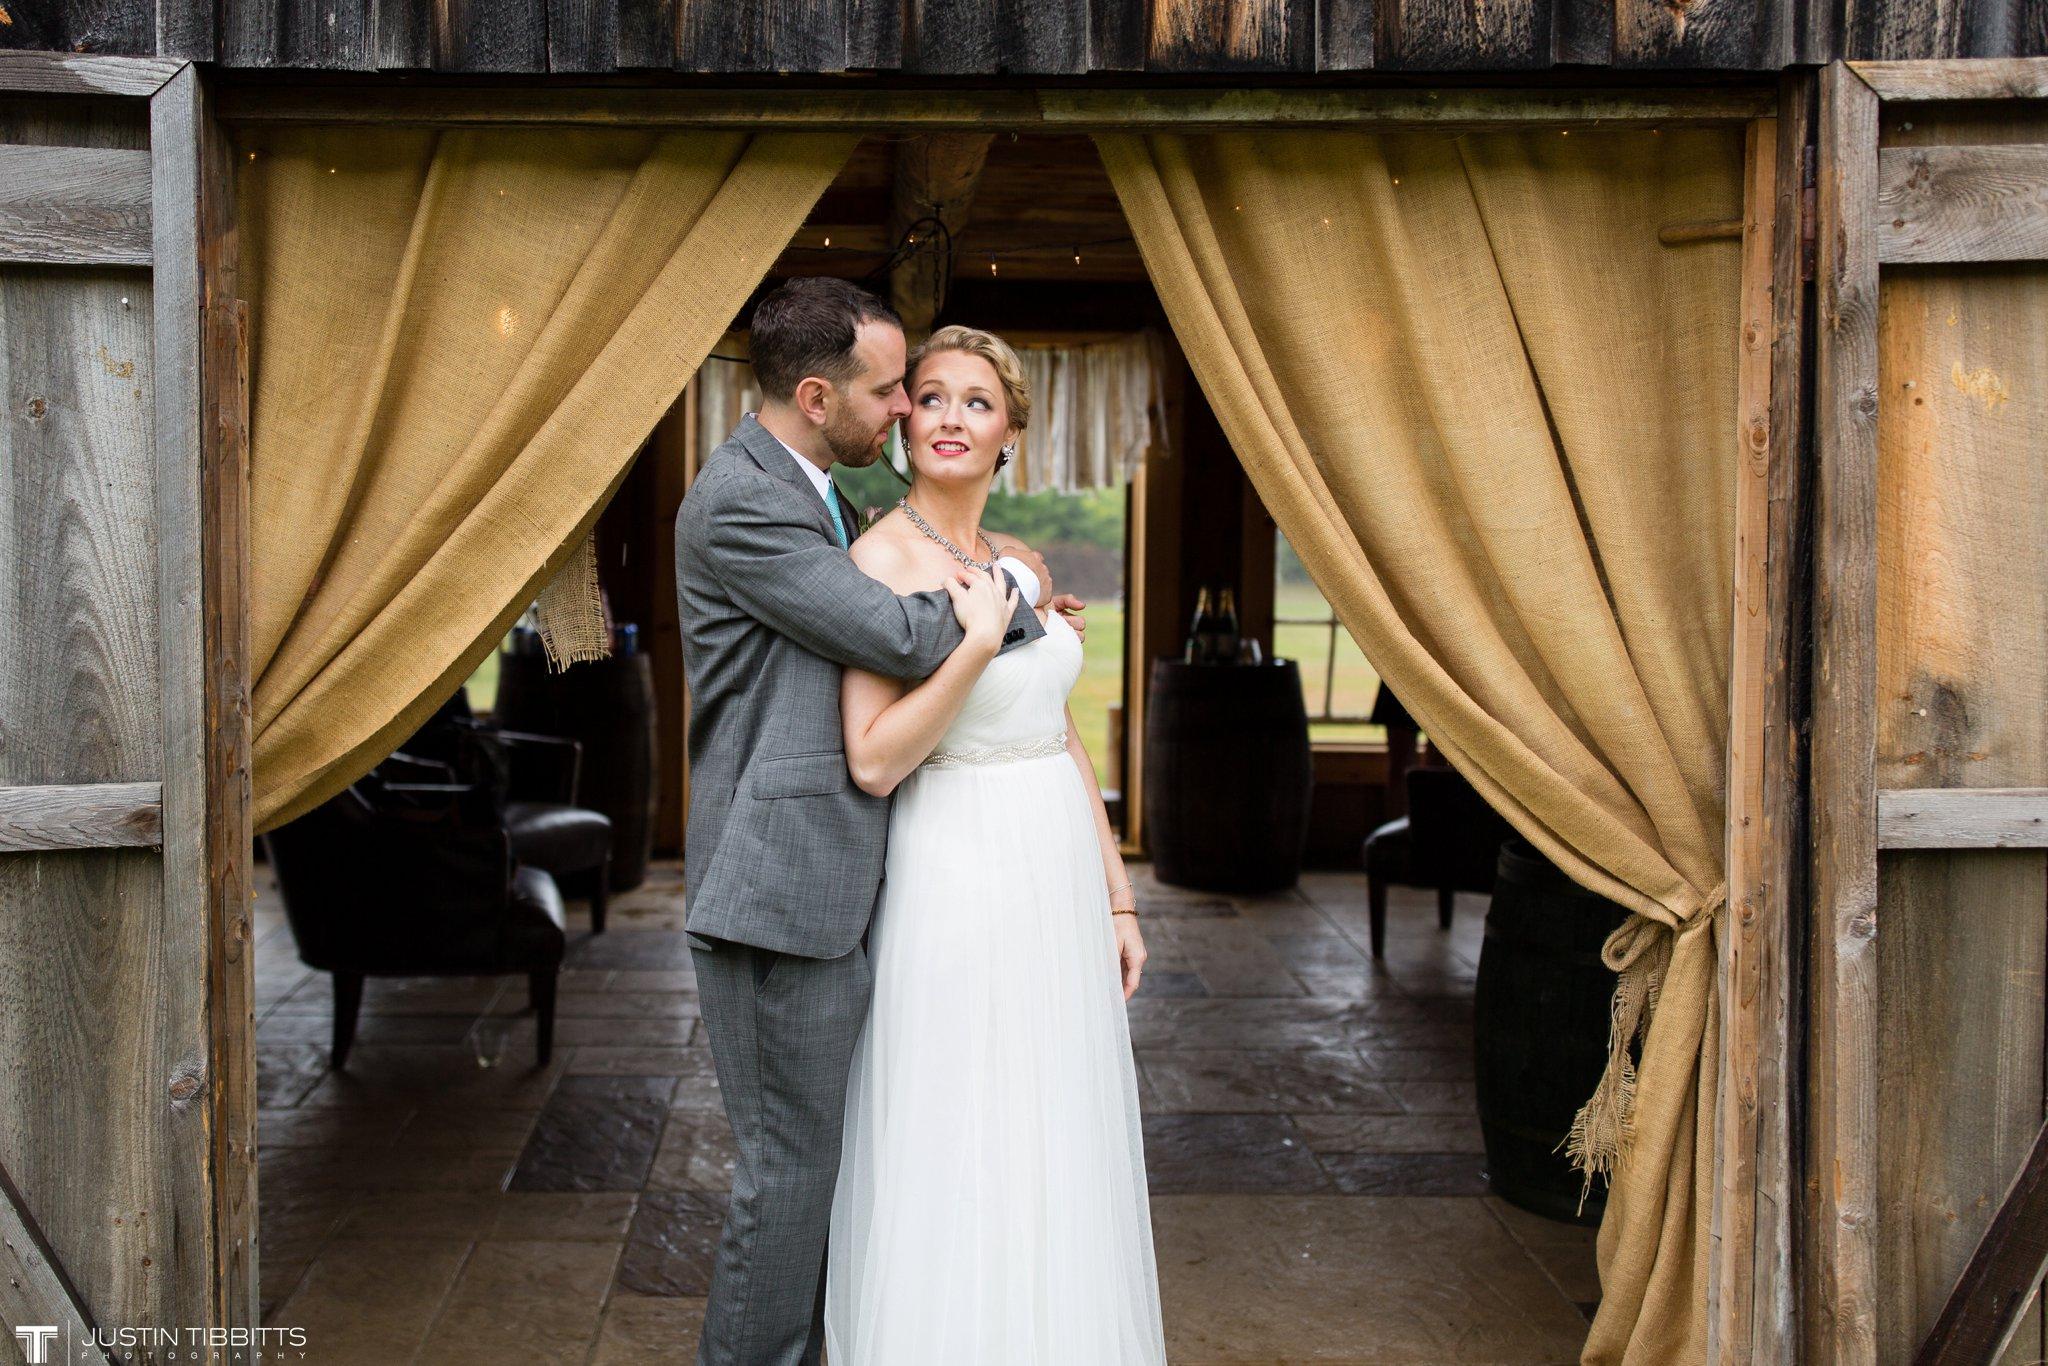 burlap-and-beams-wedding-photos-with-joran-and-molly_0087